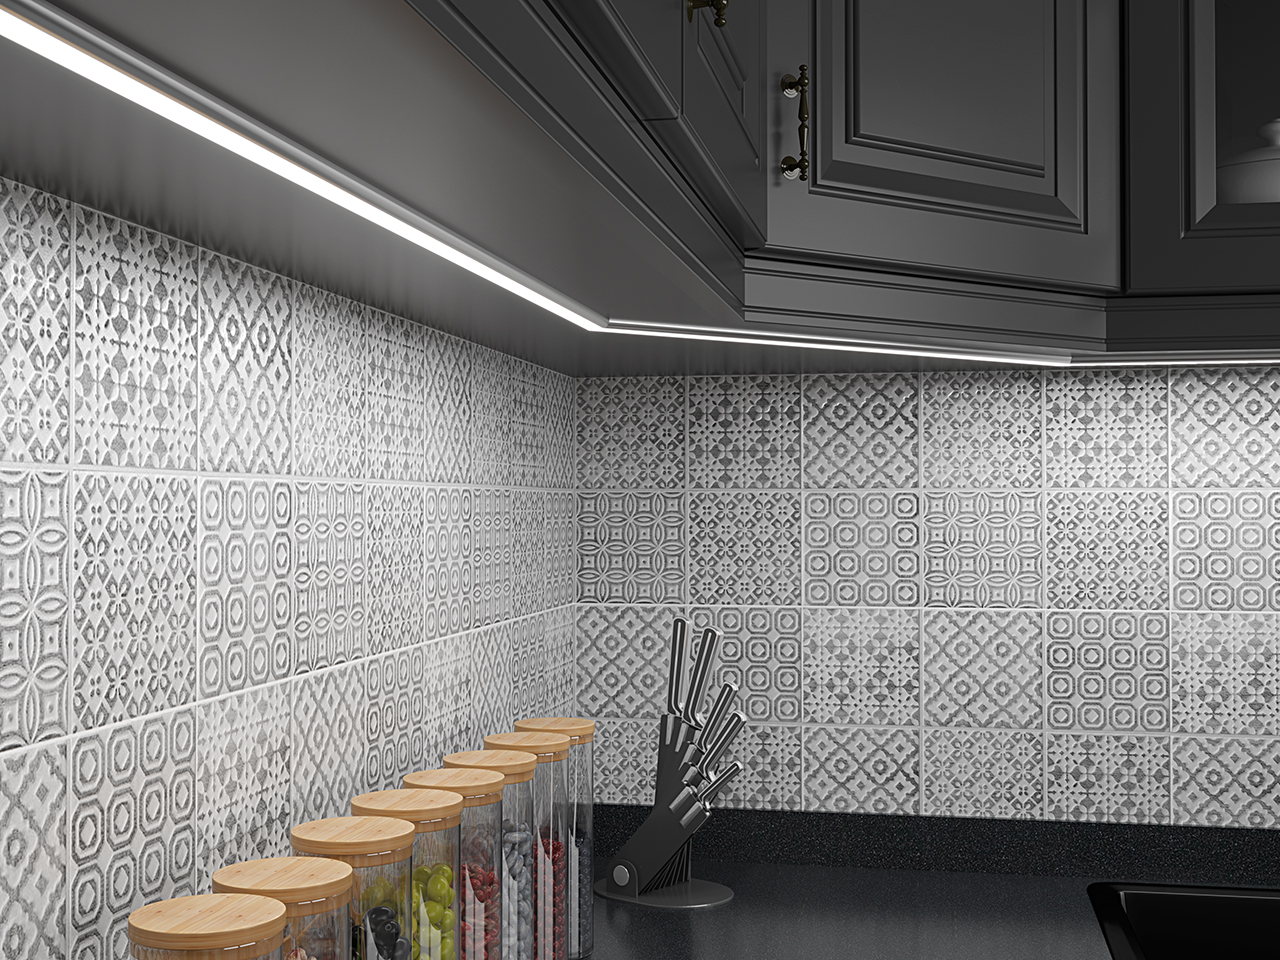 Taśmy LED w kuchni